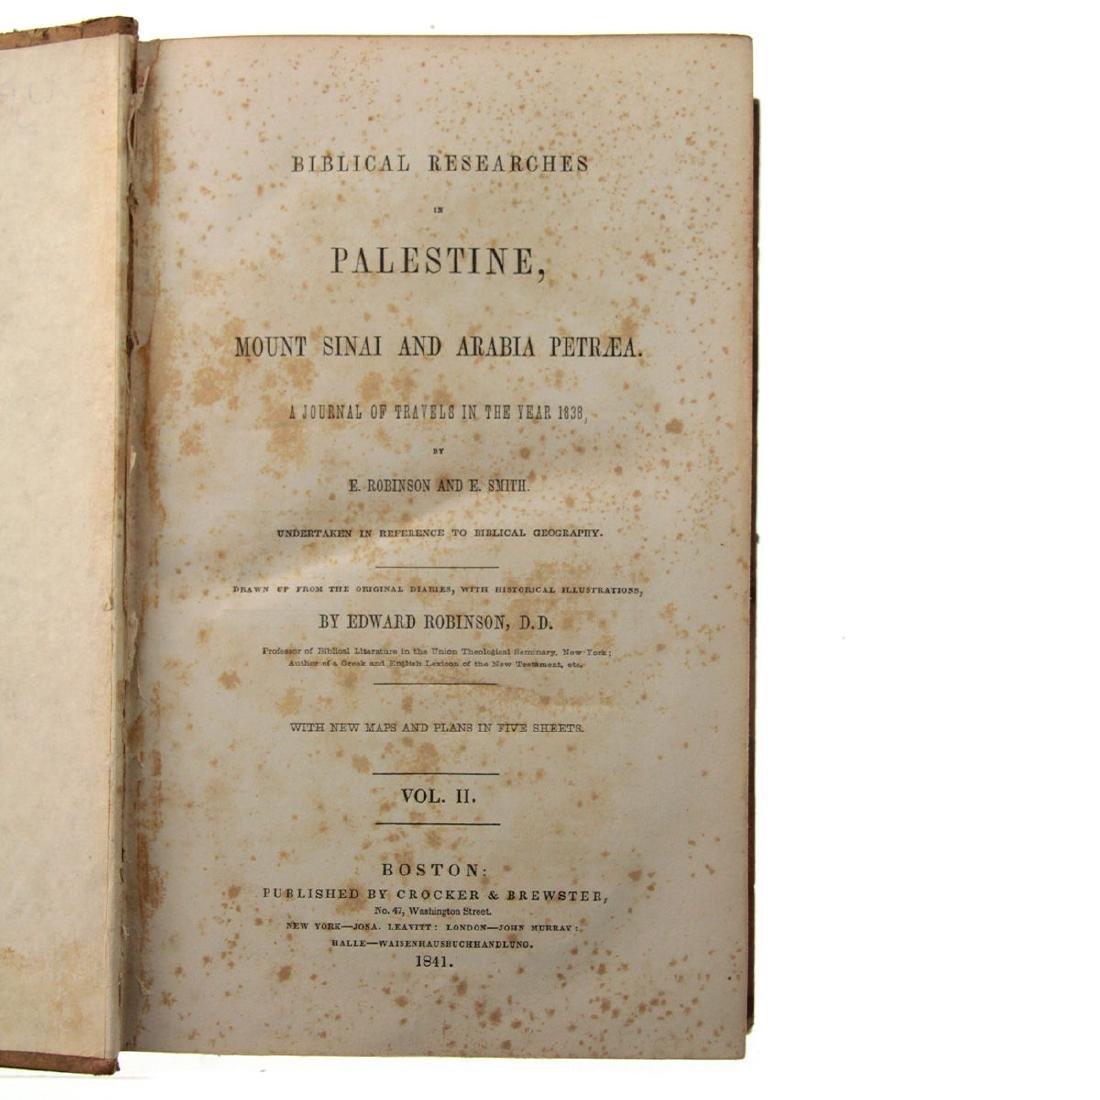 Biblical Researches in Palestine, Edward Robinson, - 3